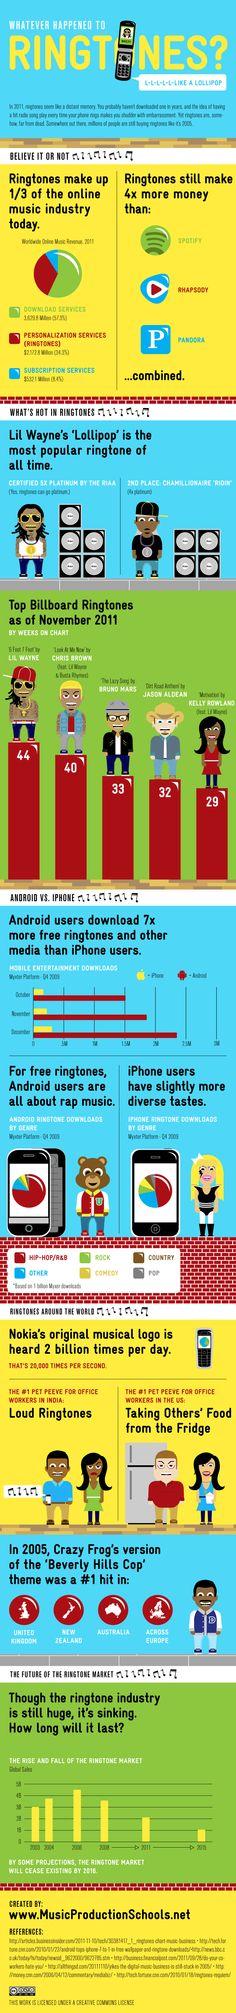 Ringtones today #infographic #flowchart